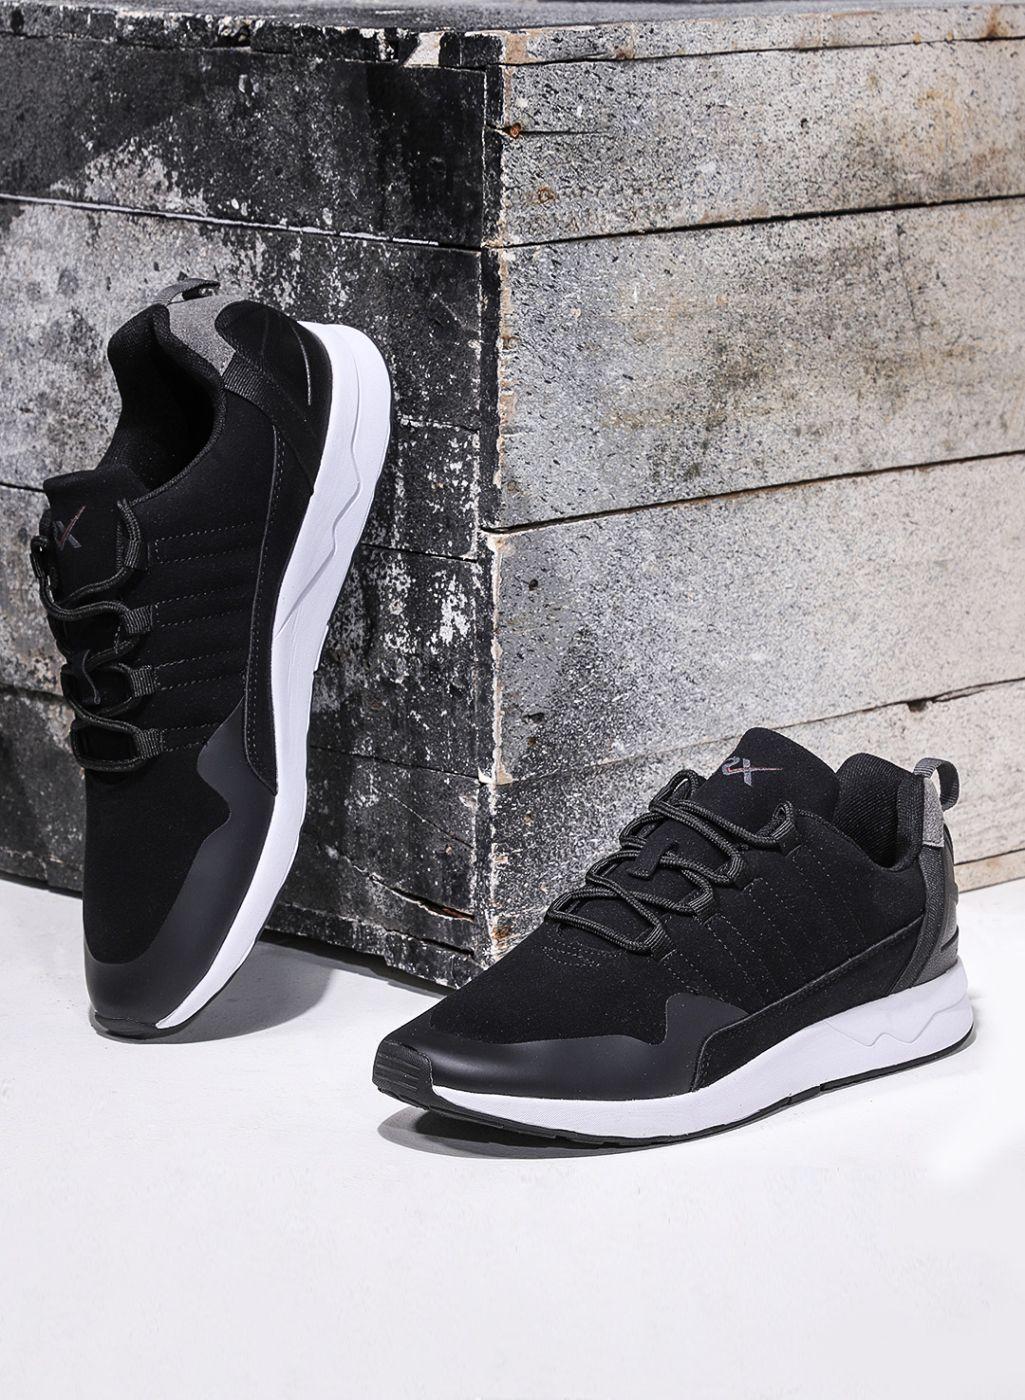 HRX by Hrithik Roshan Black Sneakers